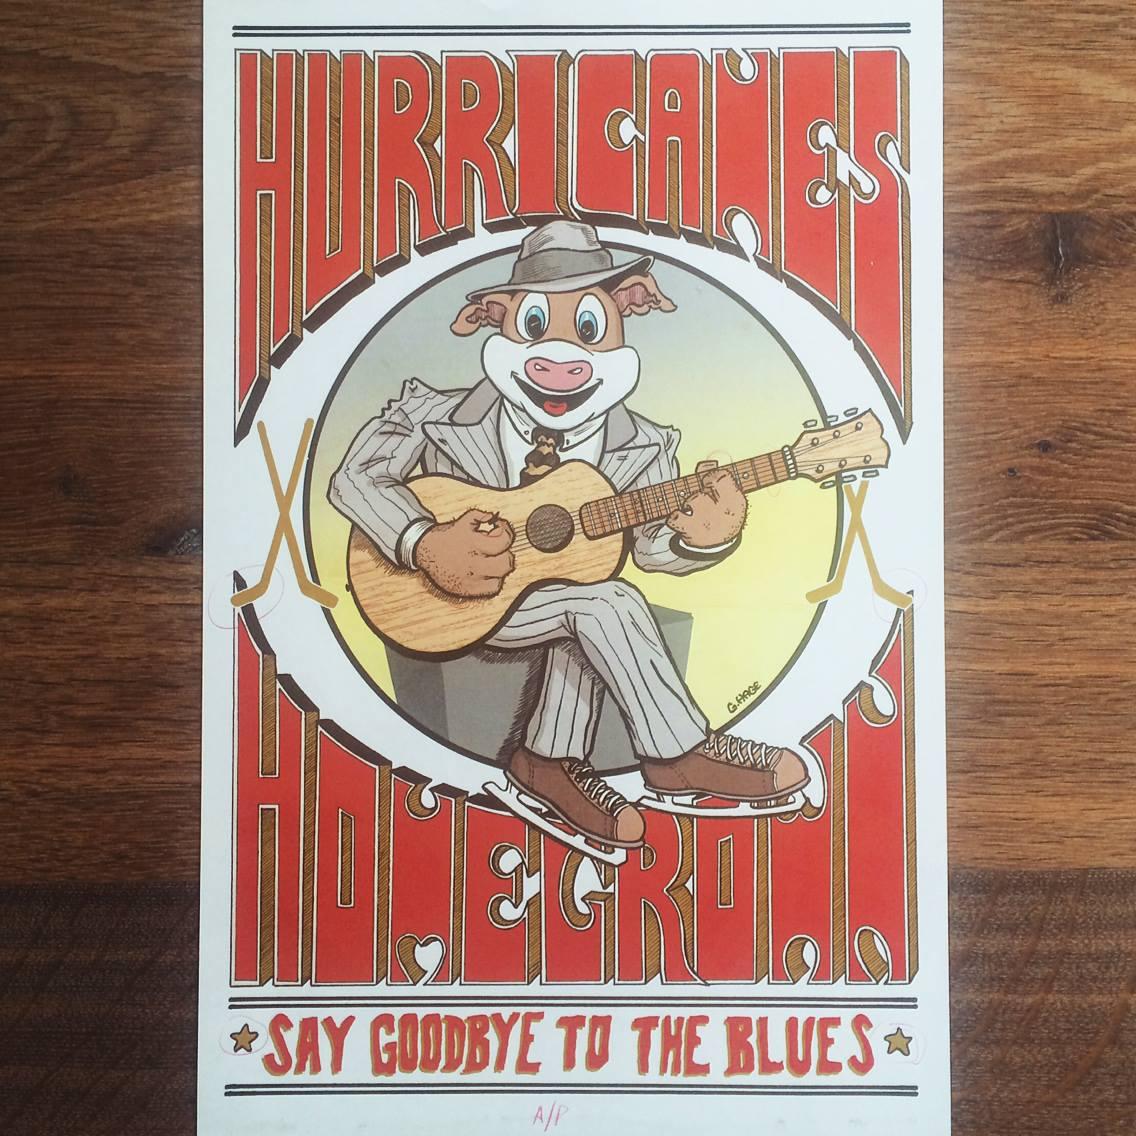 GeorgeHage_HurricanesBlues-Color2.jpg